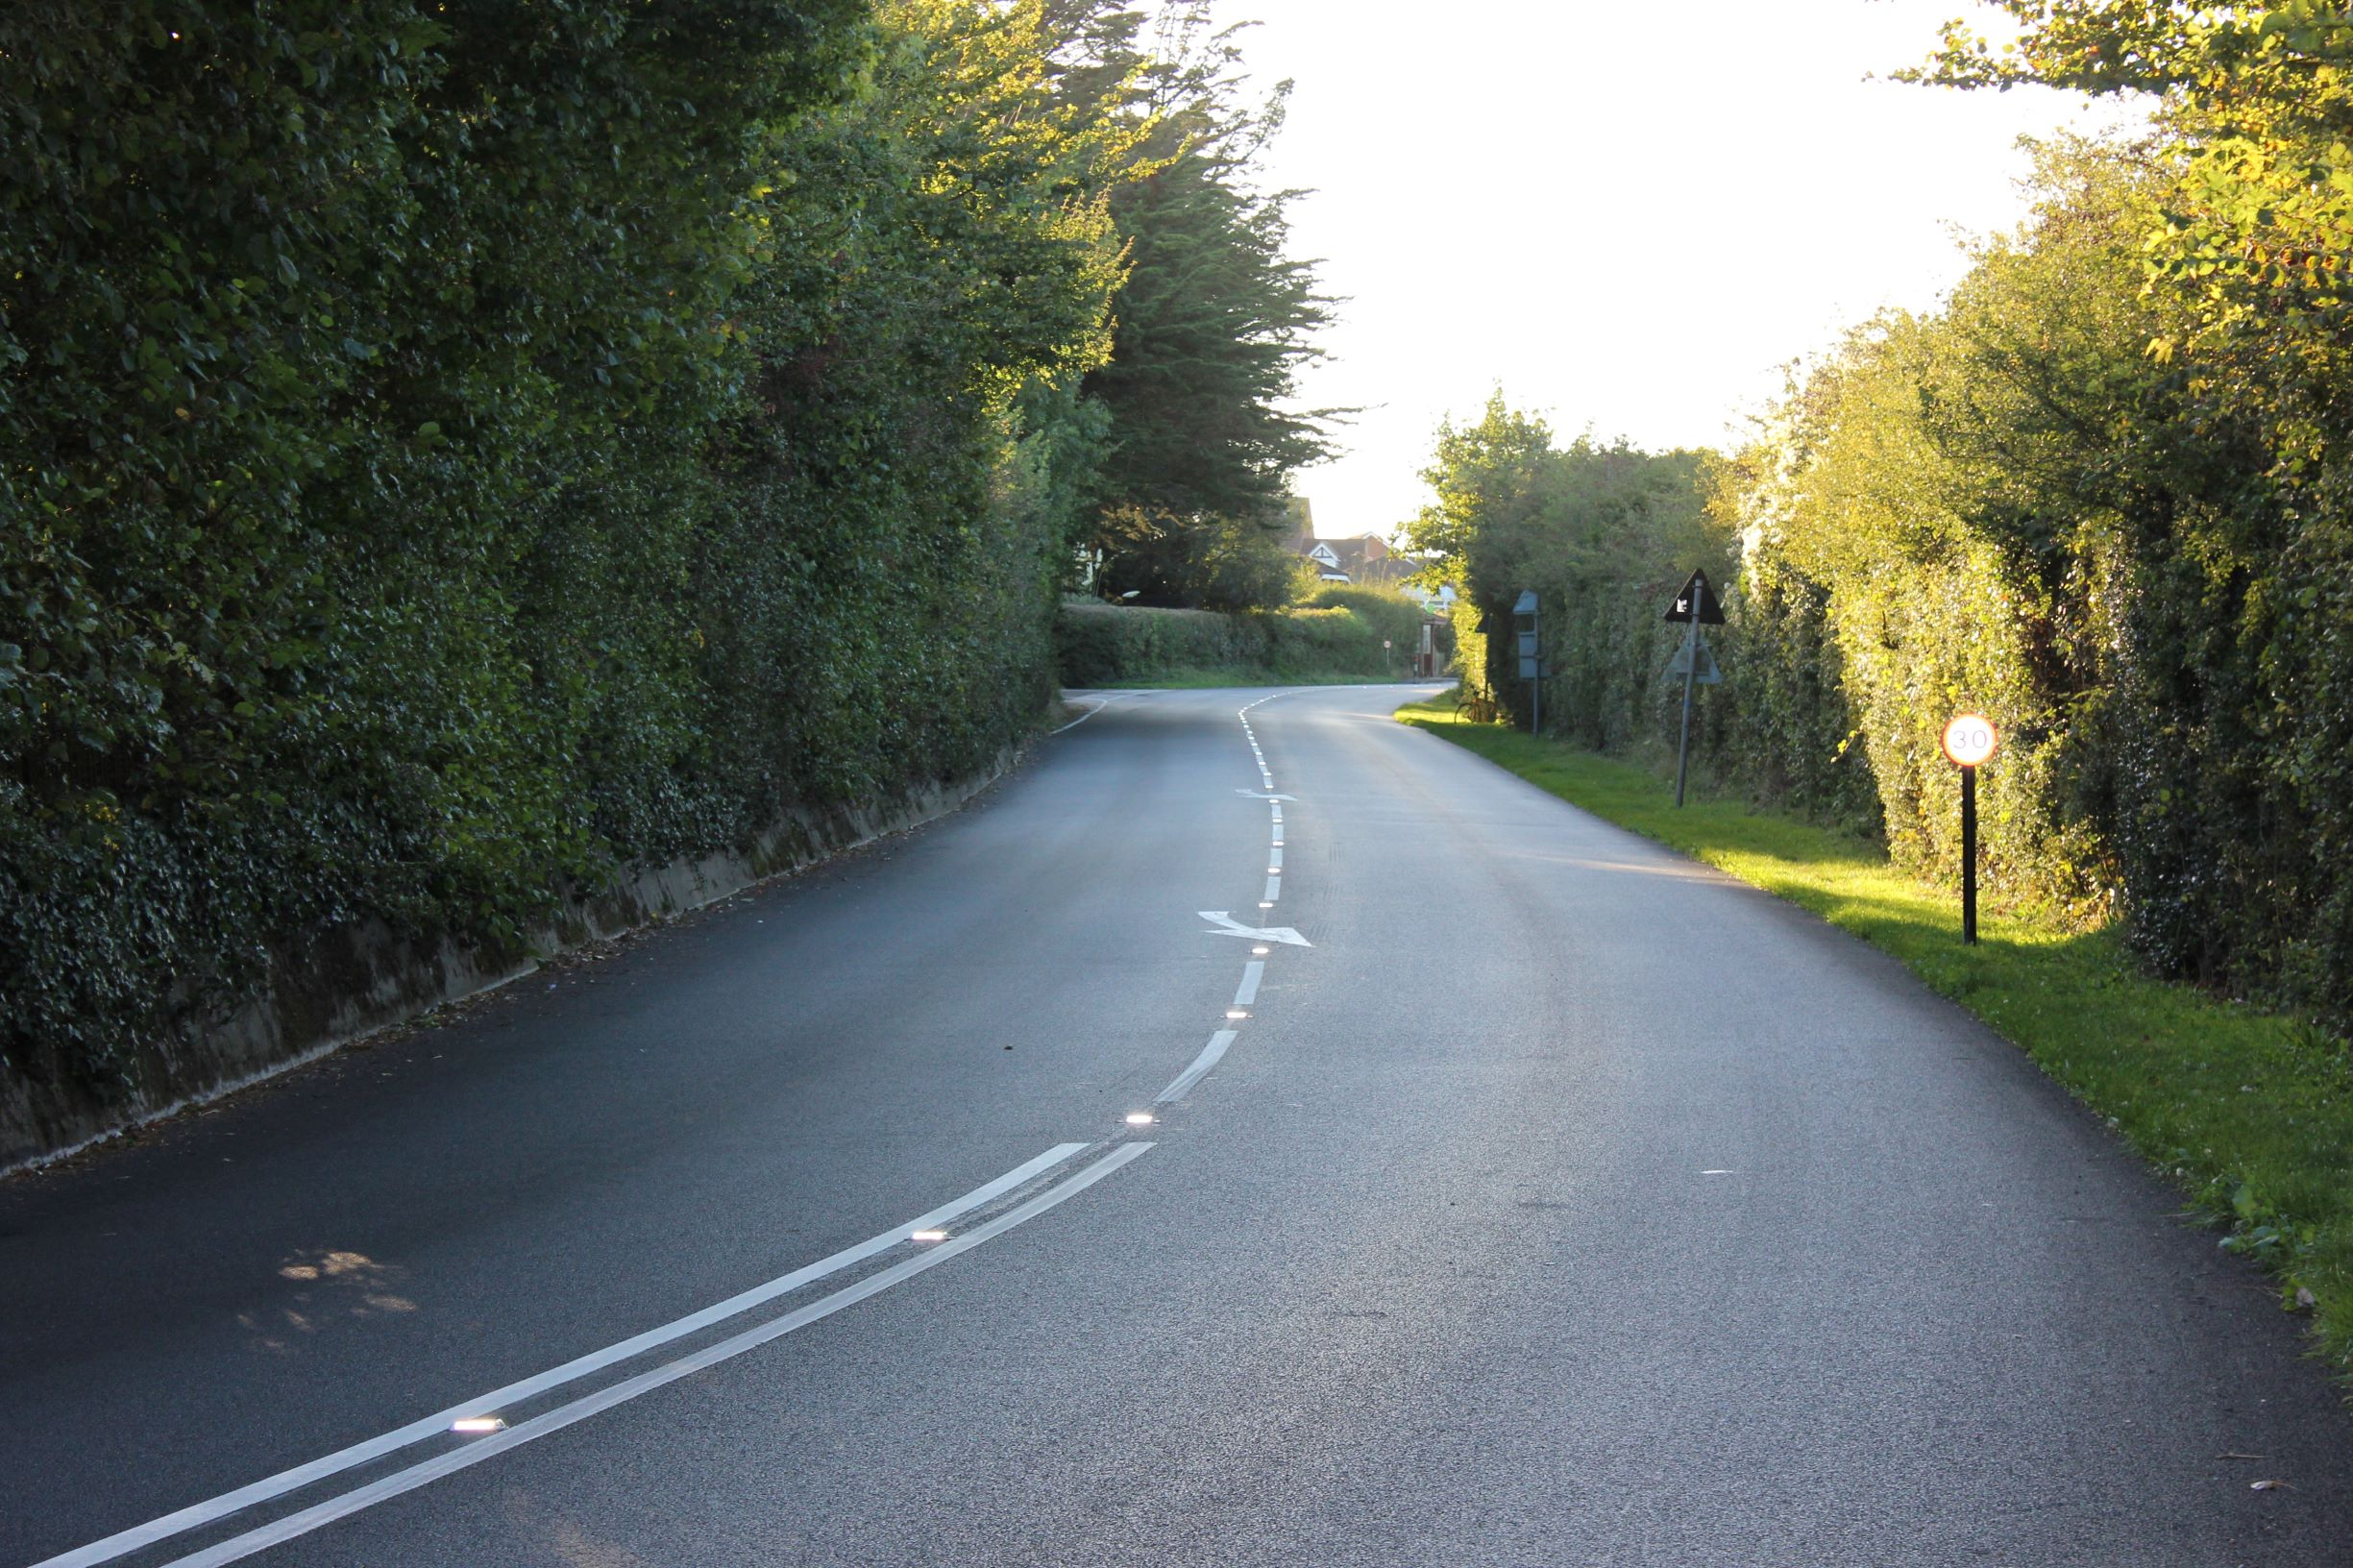 Photo showing a resurfaced road at Shalfleet